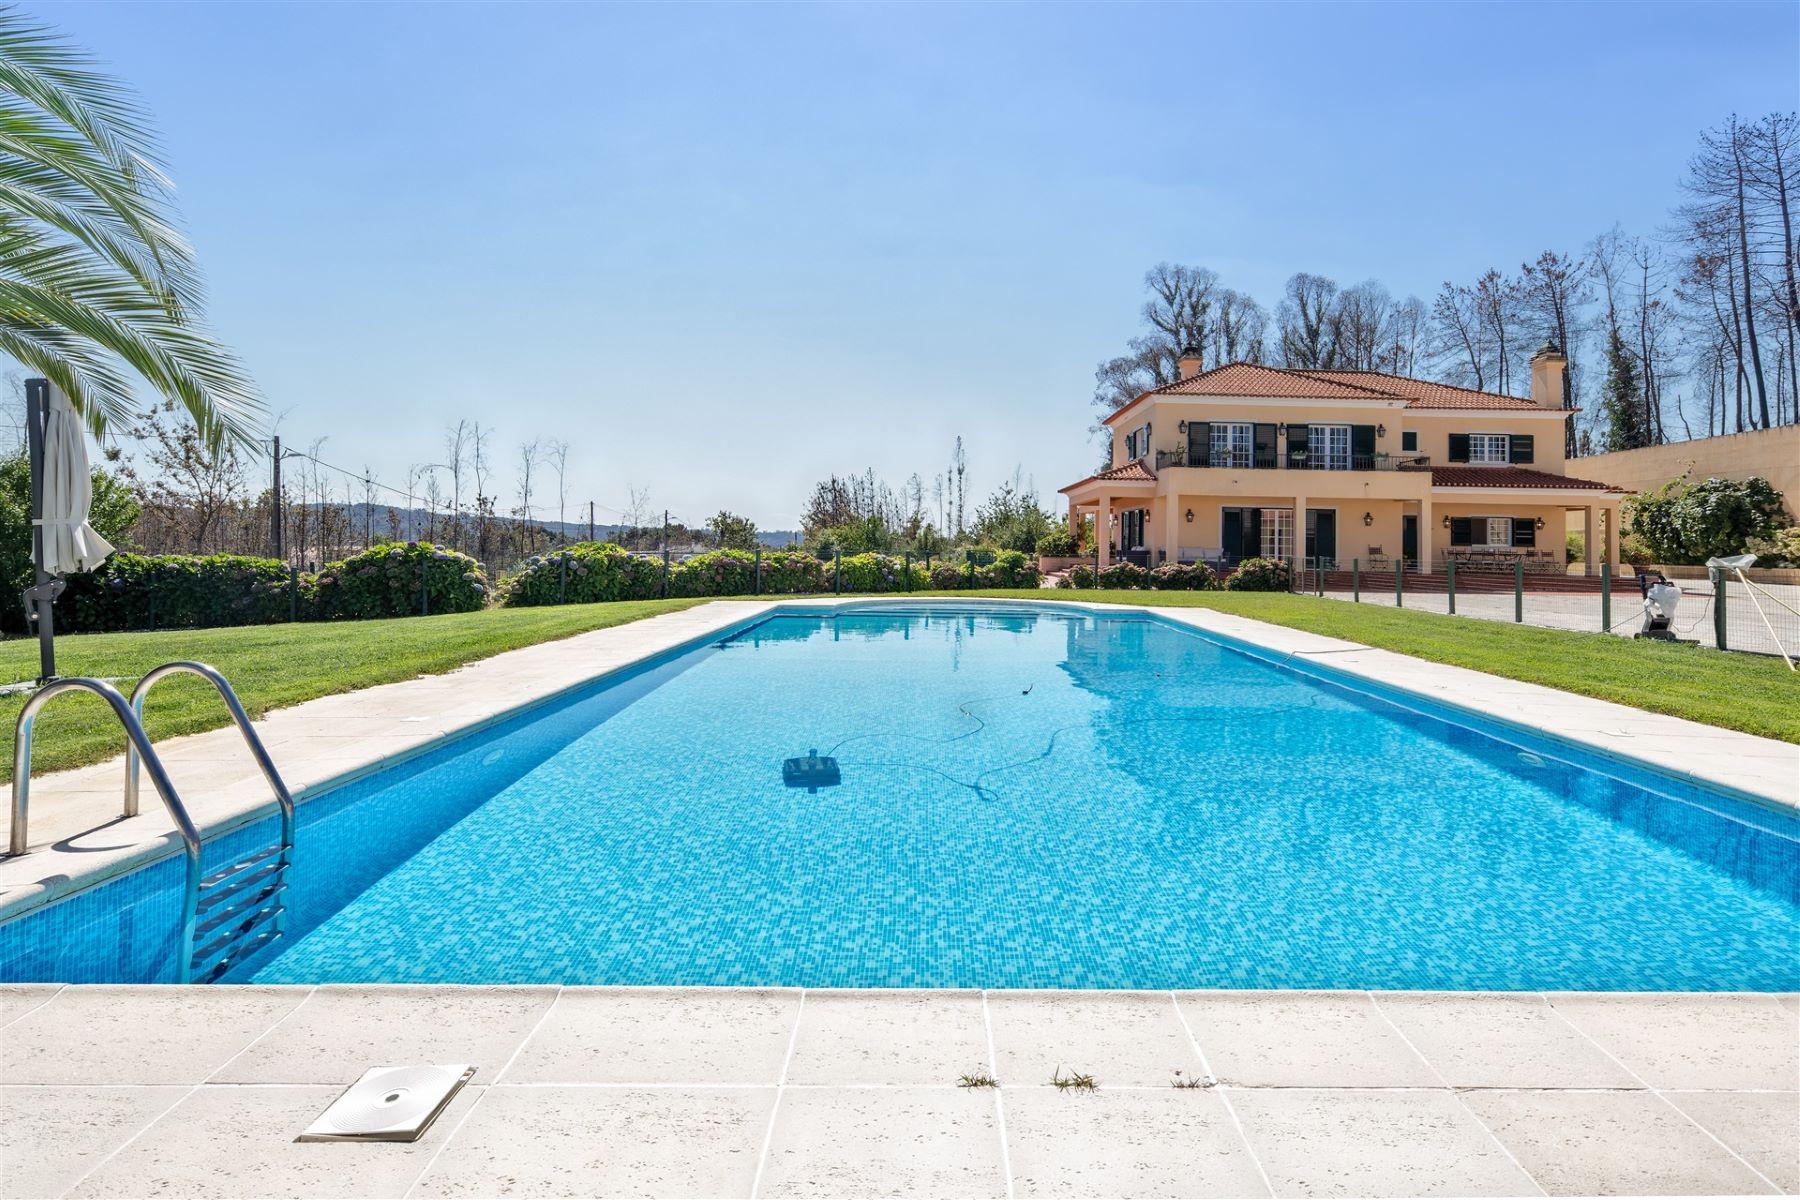 Single Family Homes for Sale at House, 7 bedrooms, for Sale Vouzela, Viseu Portugal